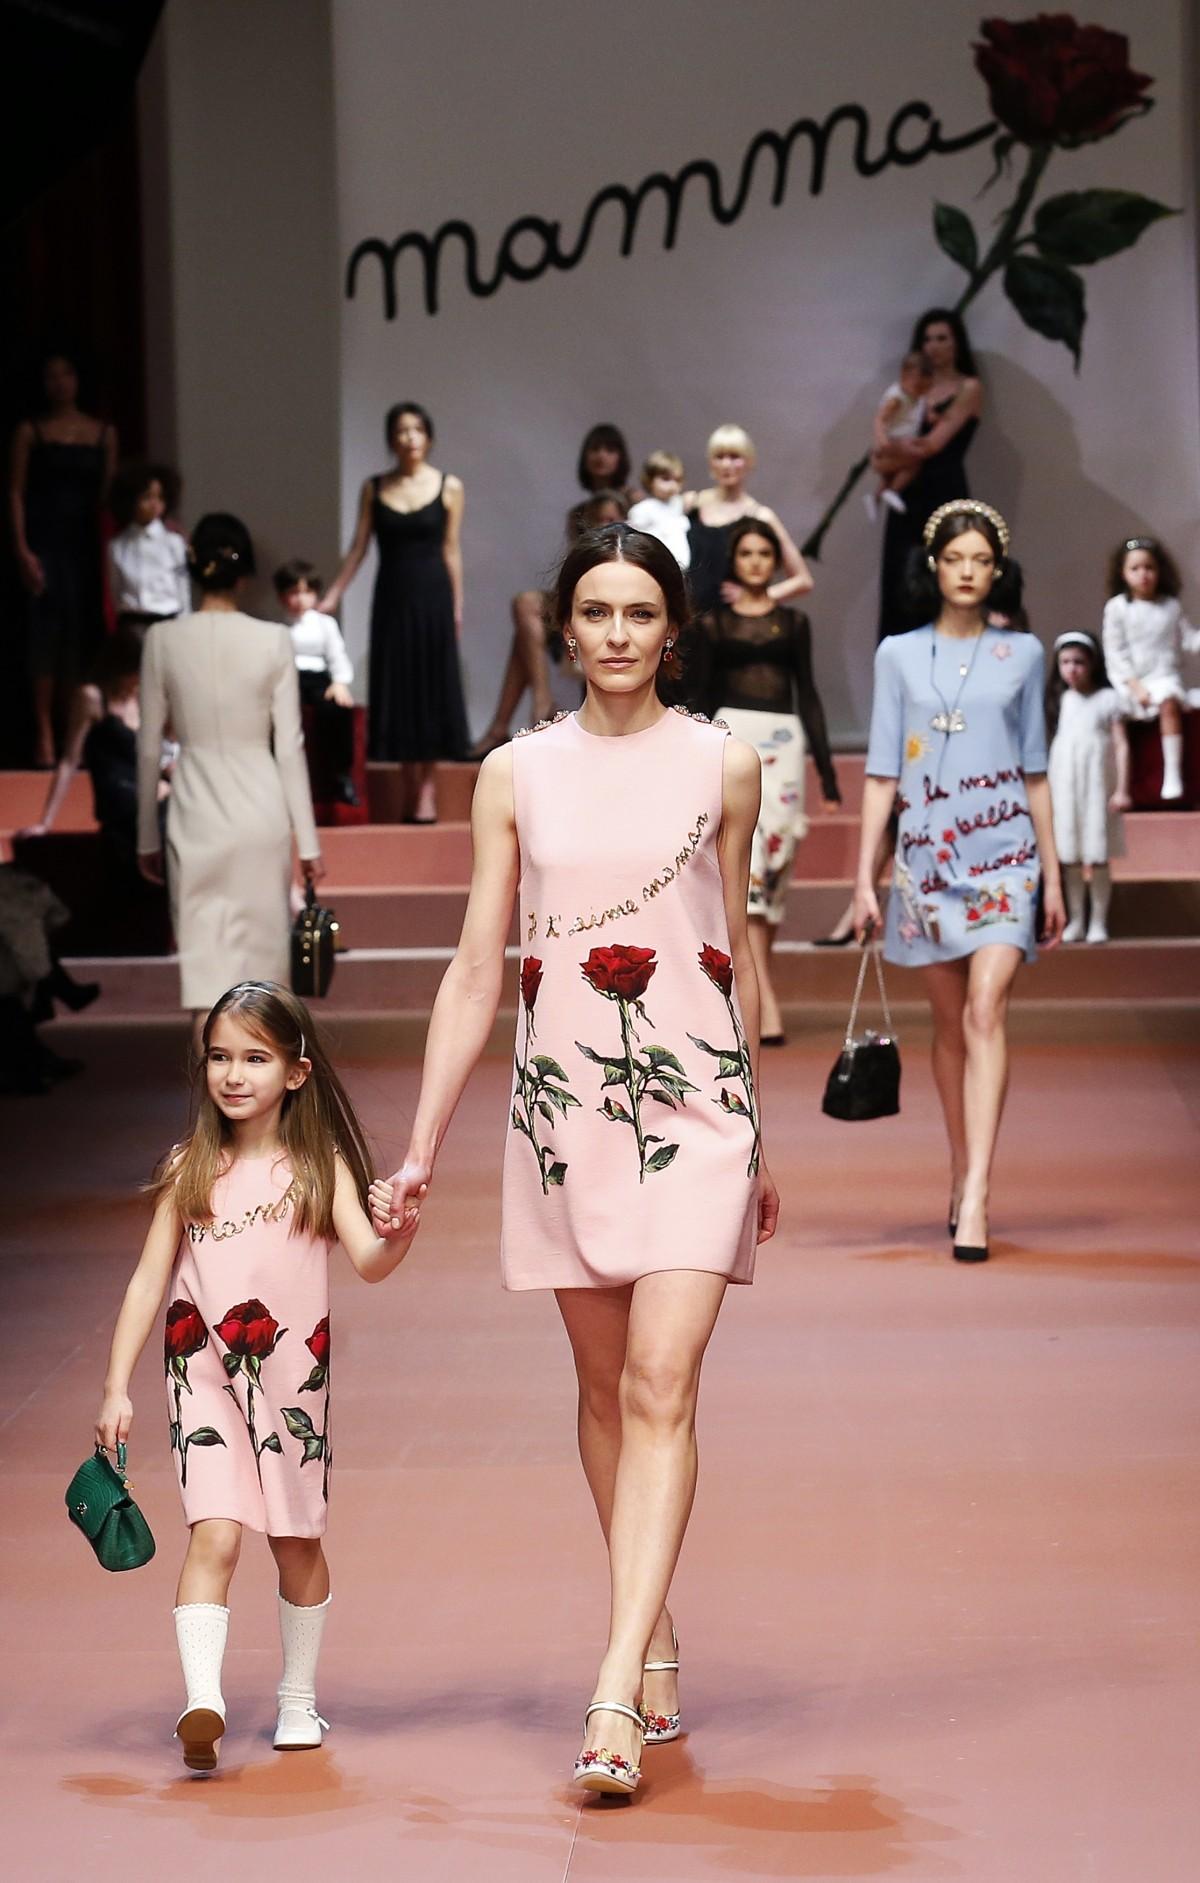 Milan Fashion Week 2015: Pregnant Models Walks The Ramp for Dolce & Gabbana